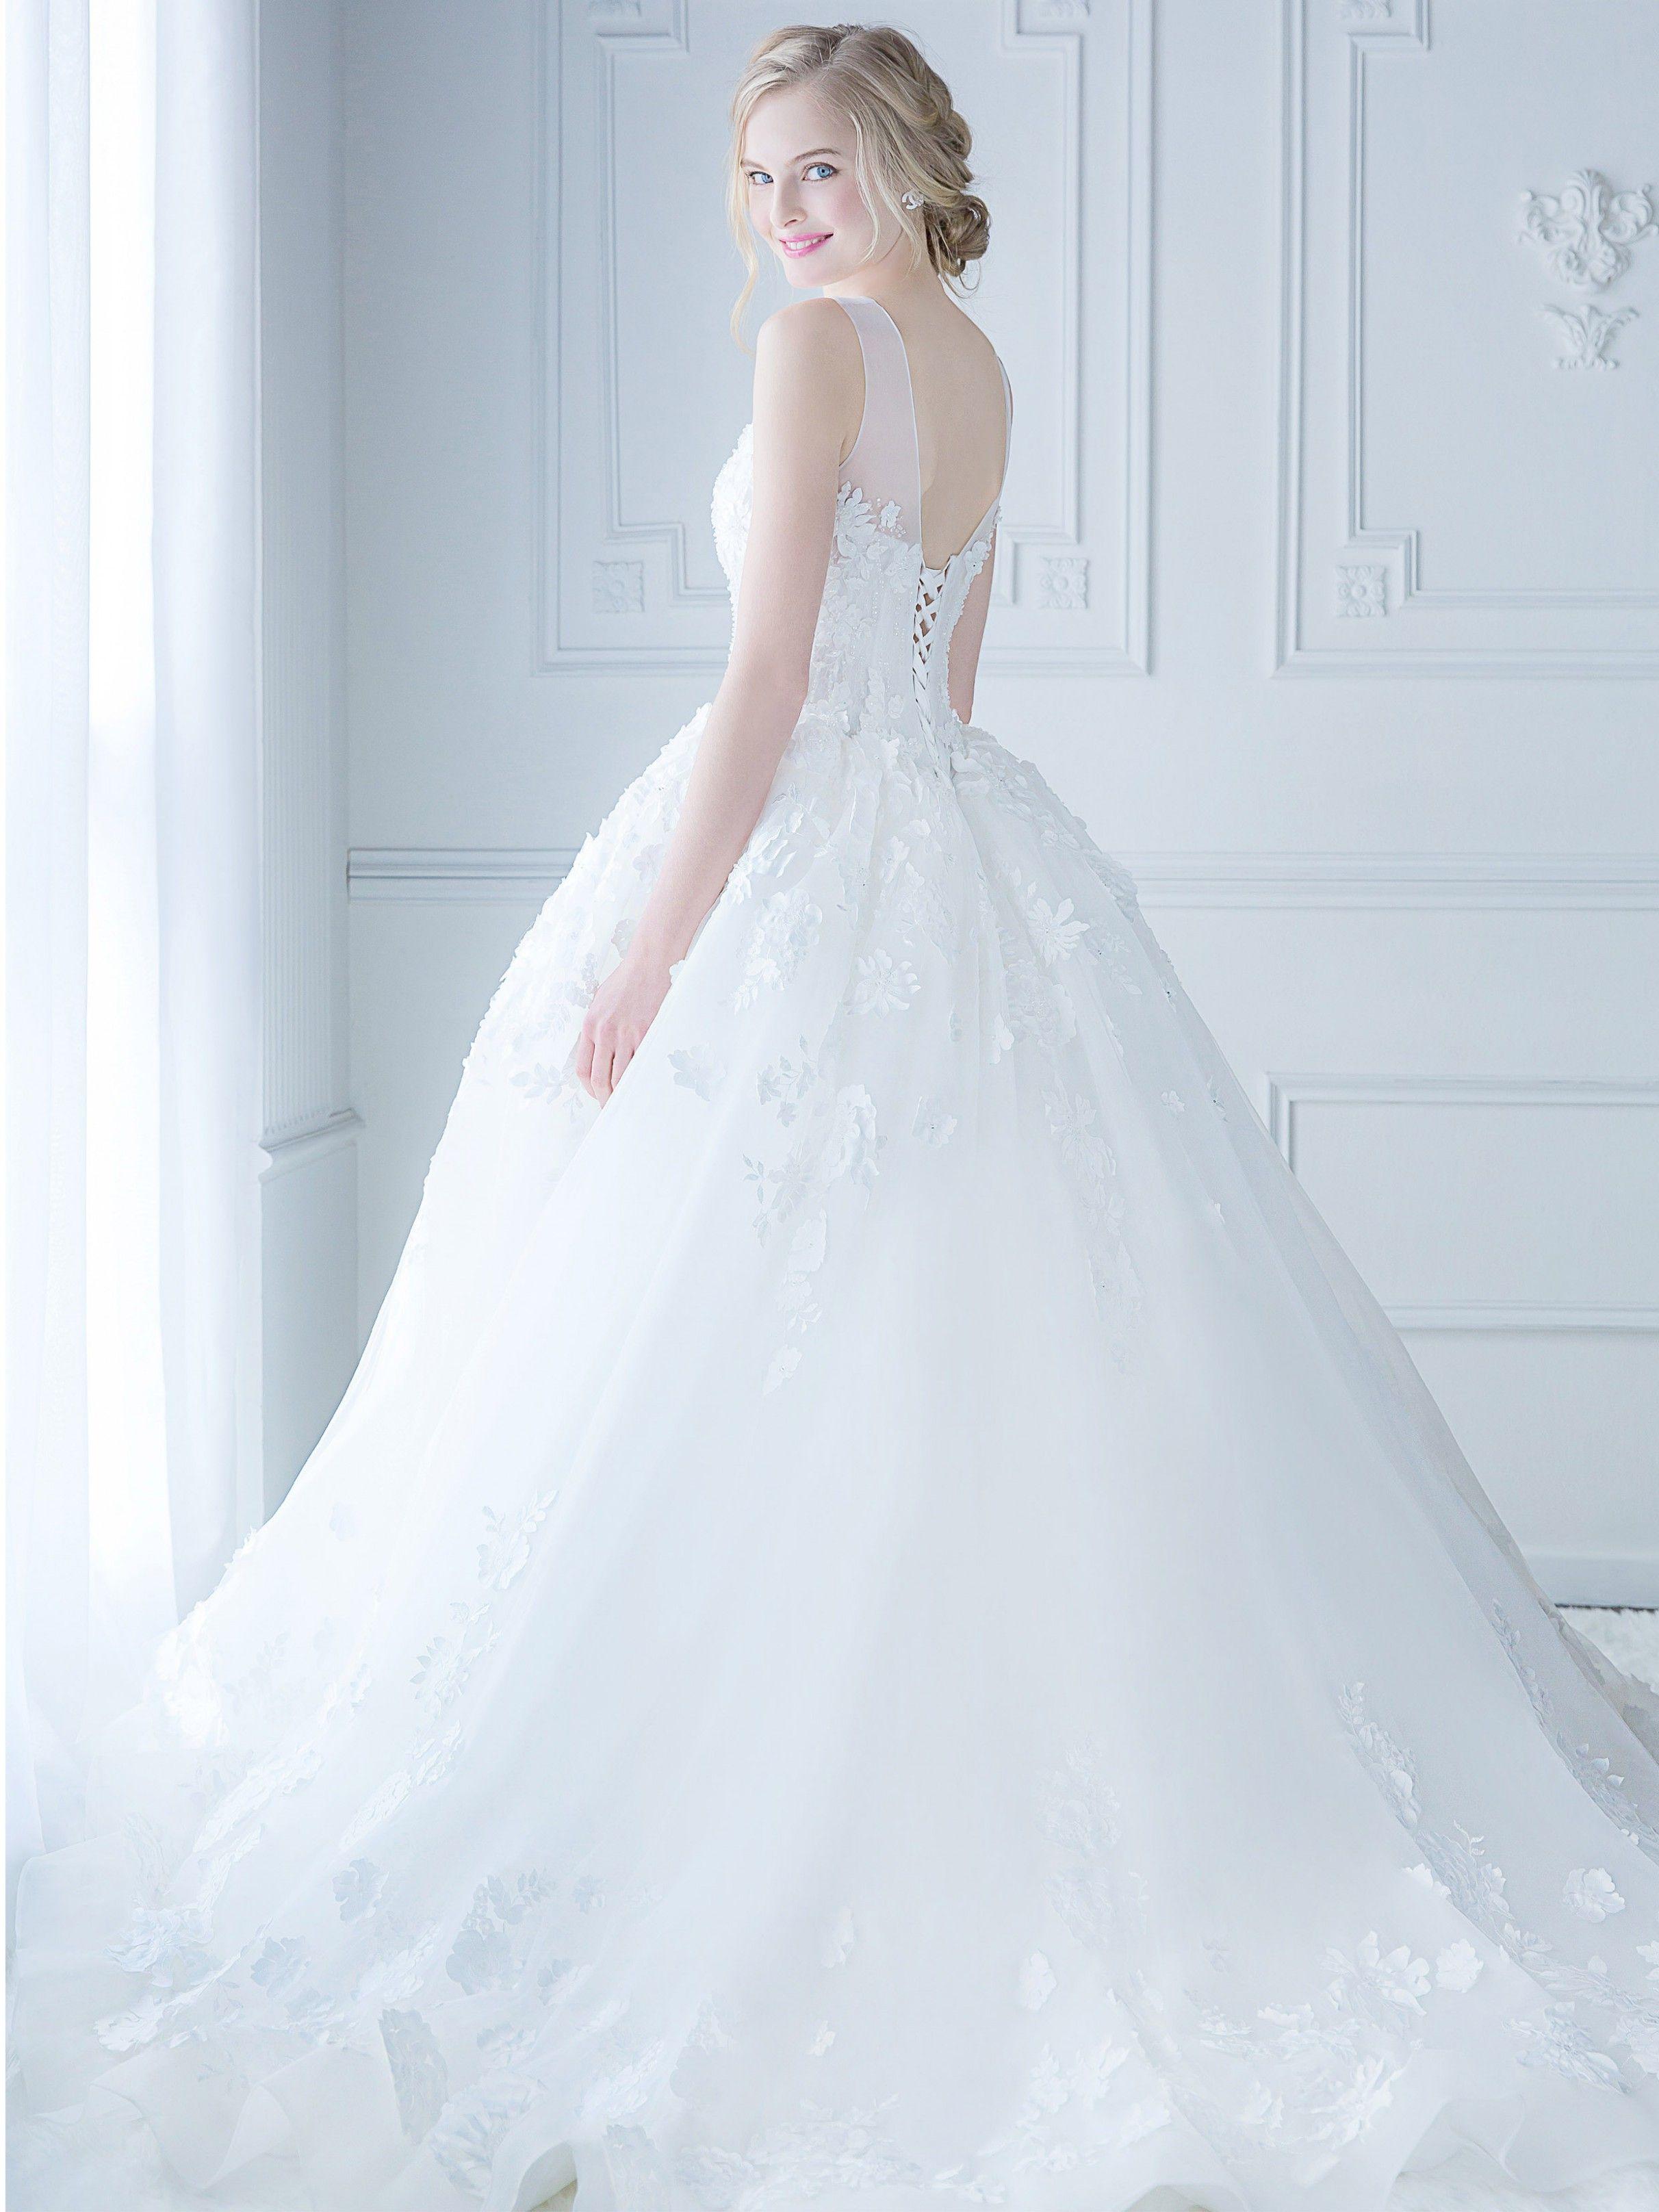 The Princess Bride - Digio Bridal | wedding dresses | Pinterest ...